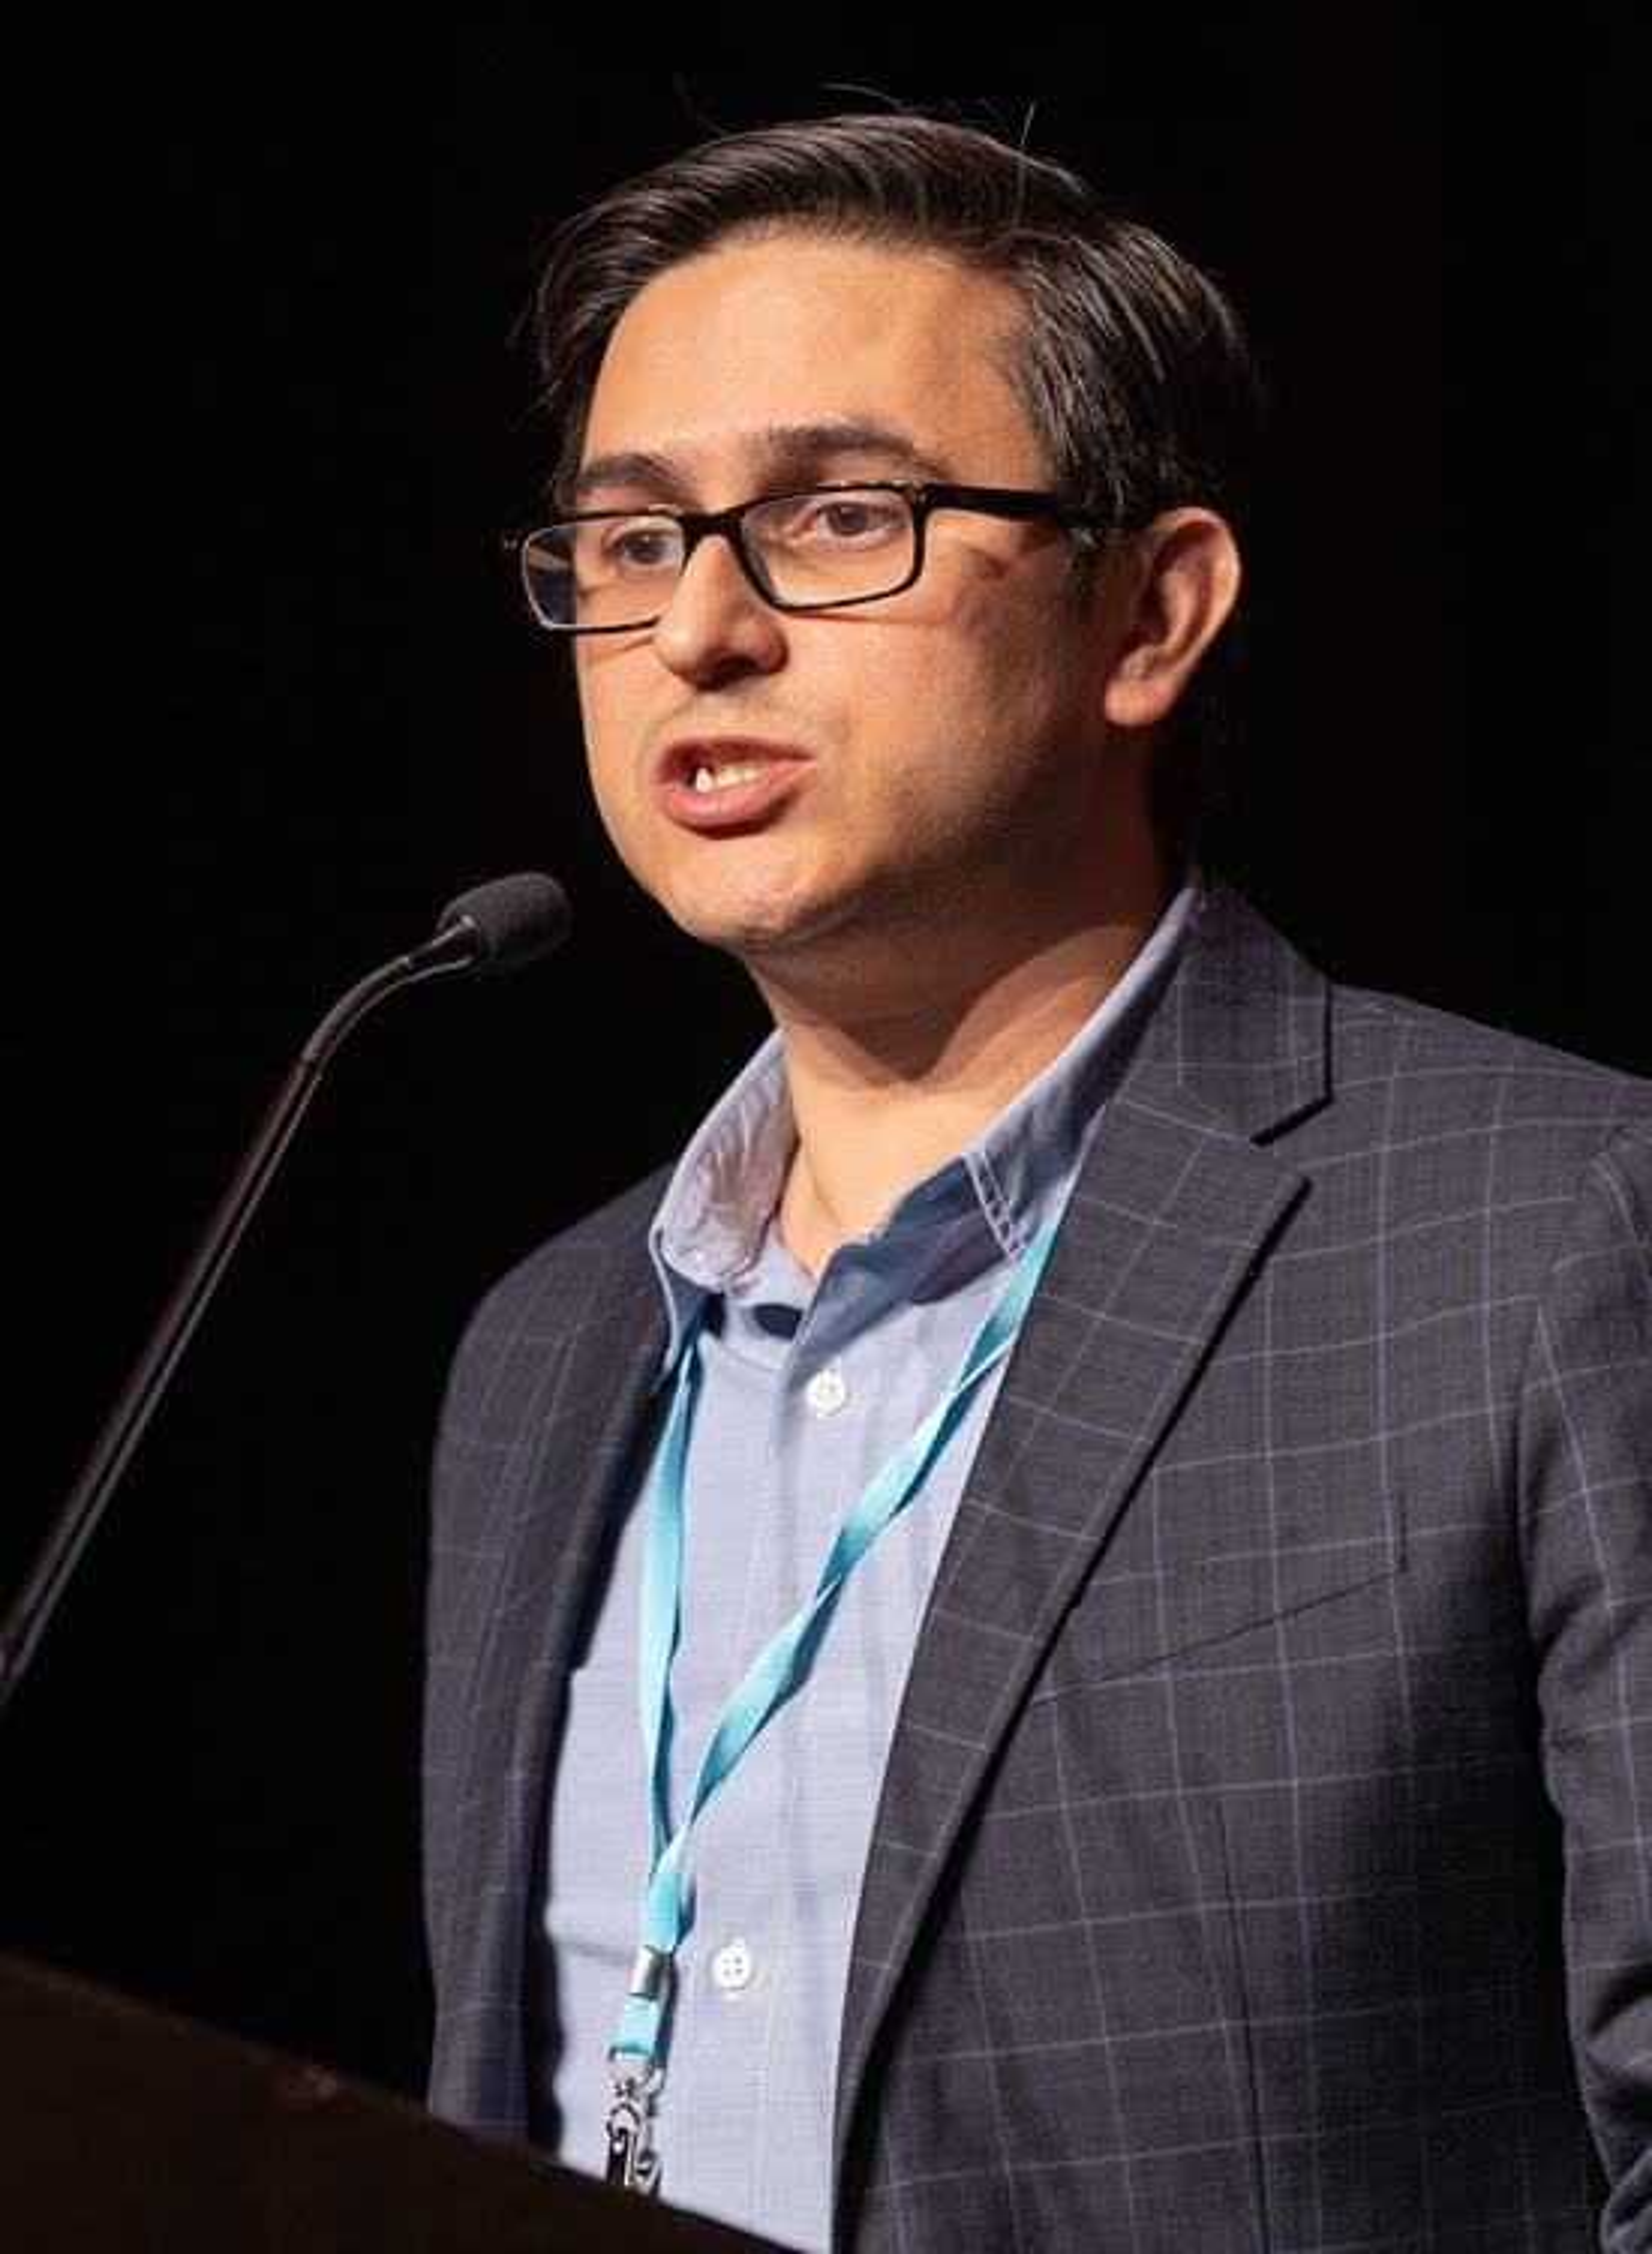 Manuel Padilla, Director Interino del Plan Nacional para el Ministerio Hispano-Latino. Foto Mike DuBose, Noticias MU.